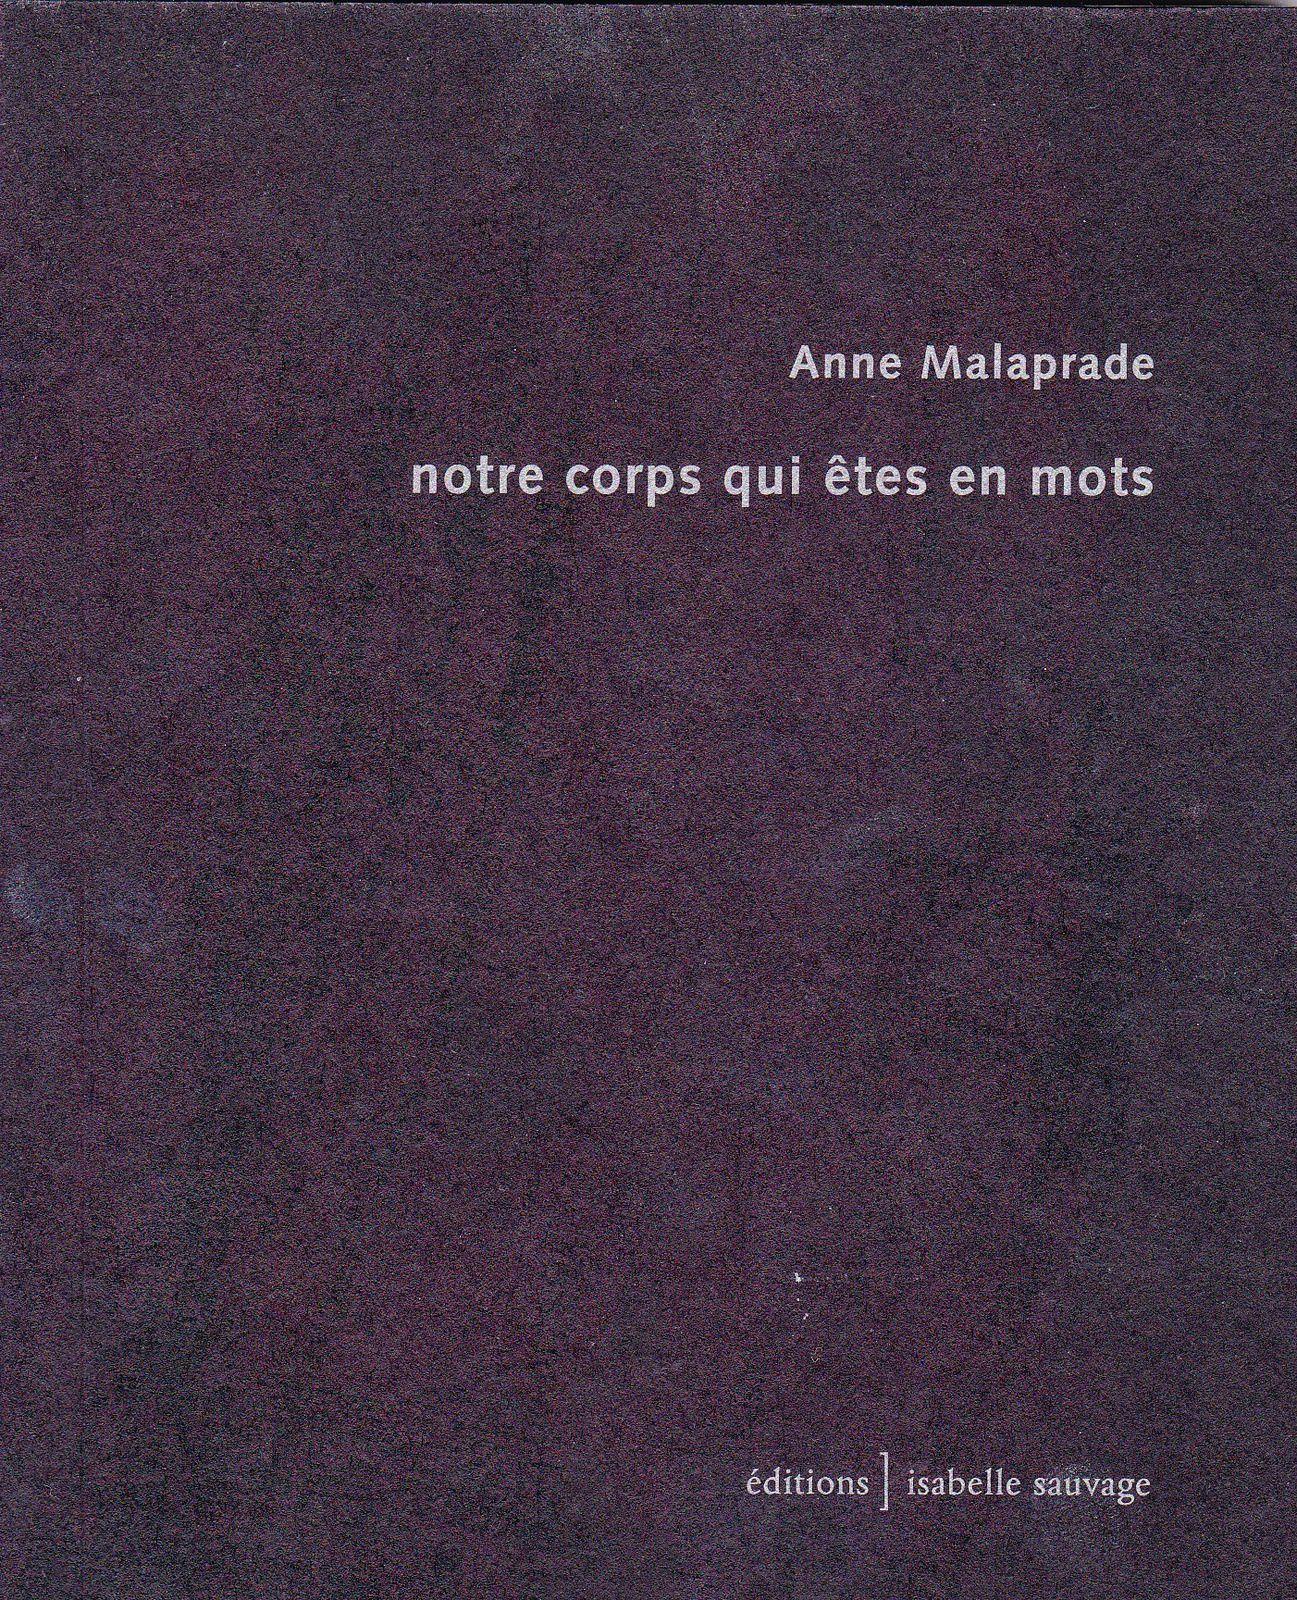 Election - Anne Malaprade